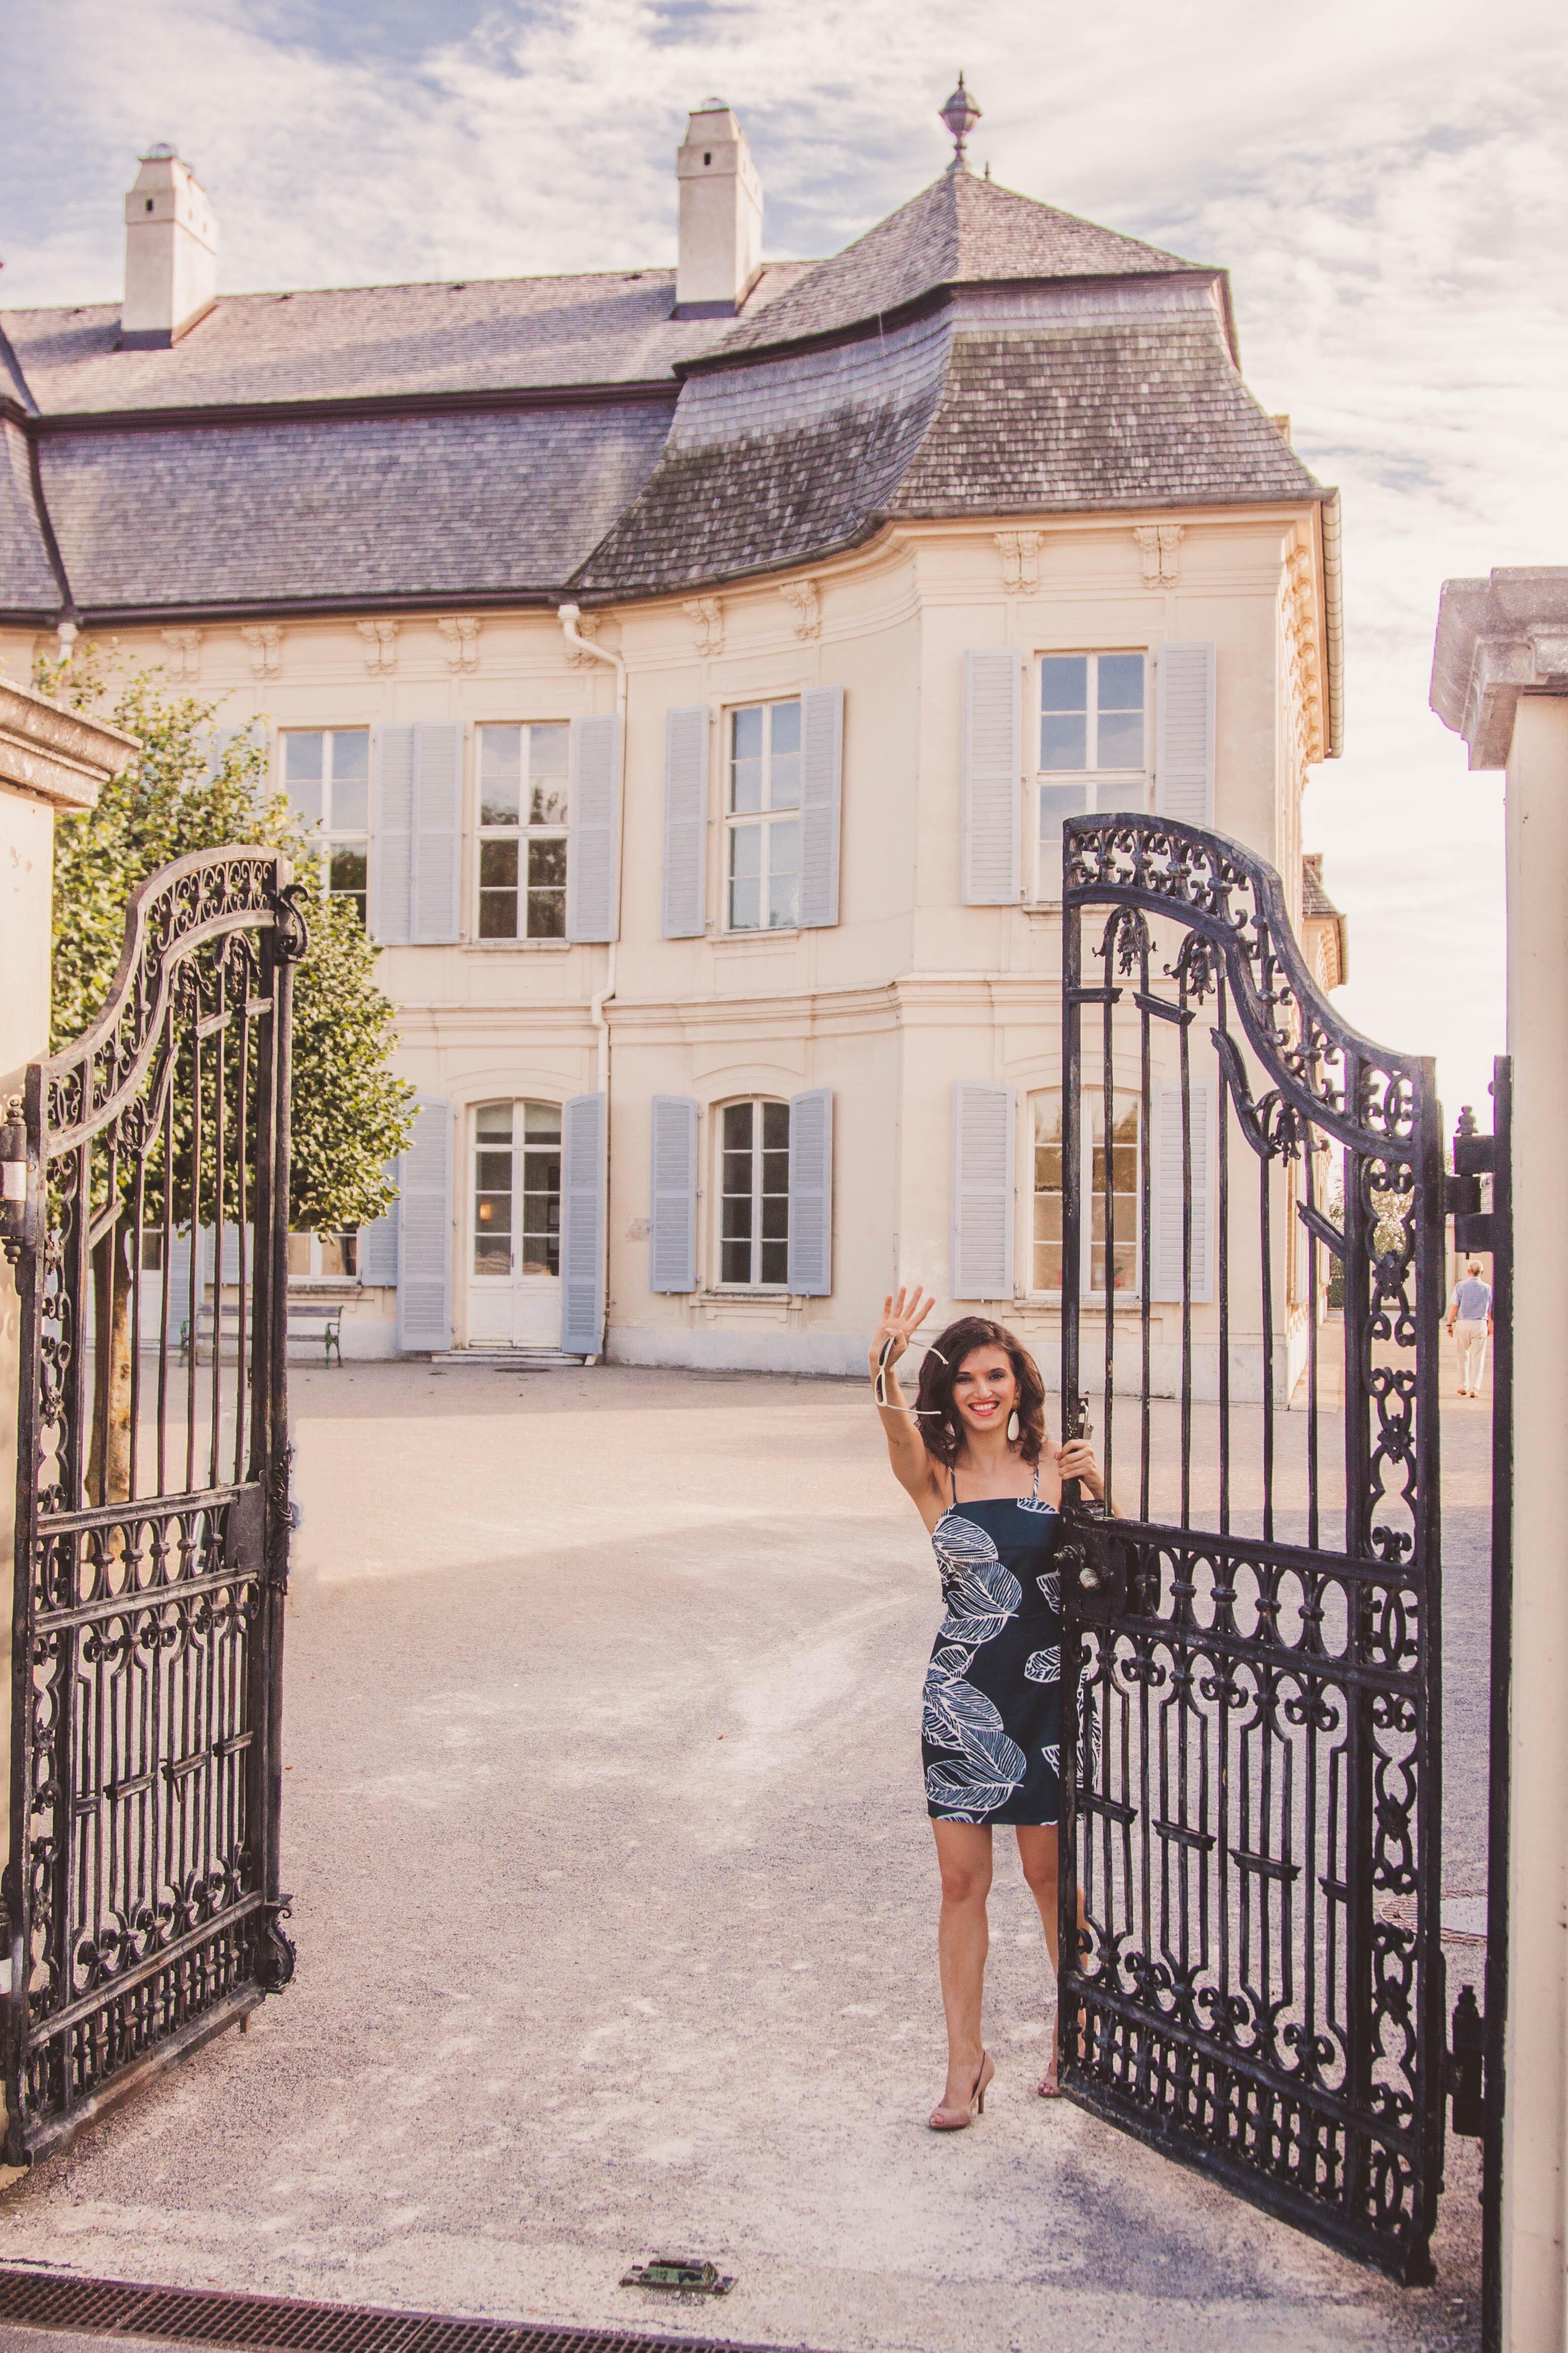 palace Austria